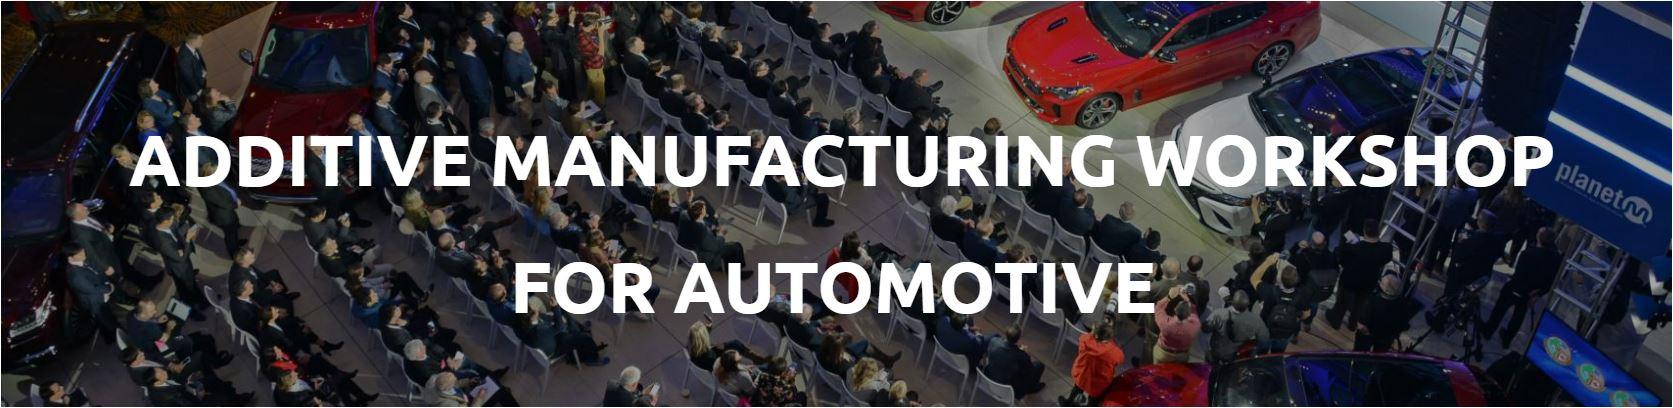 AM Workshop for Automotive.JPG